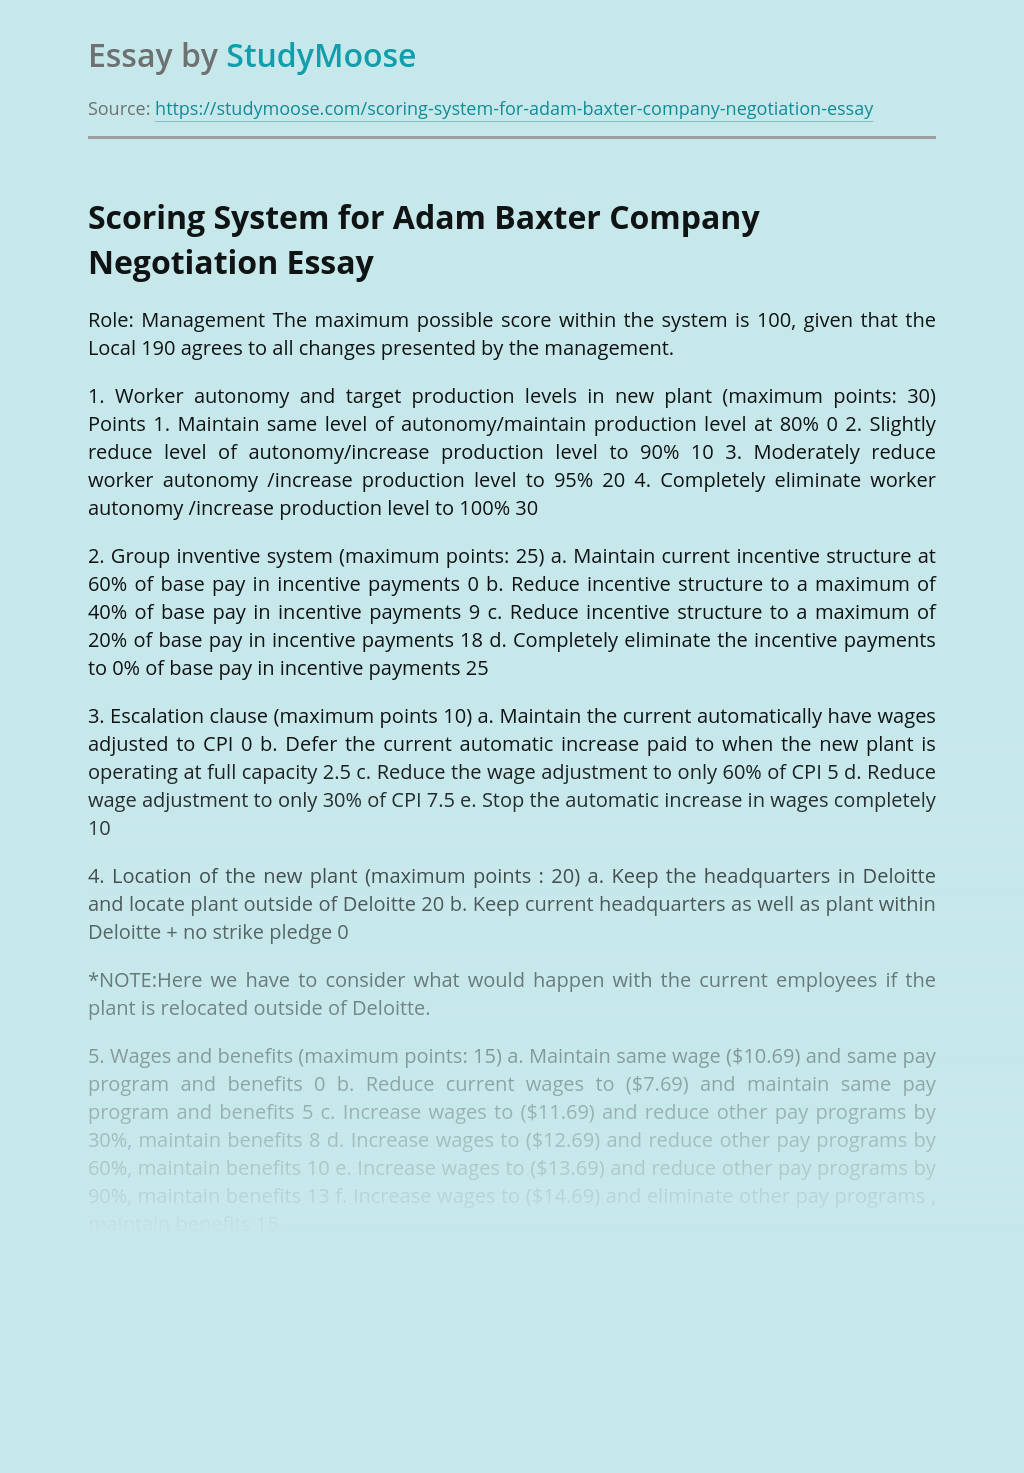 Scoring System for Adam Baxter Company Negotiation